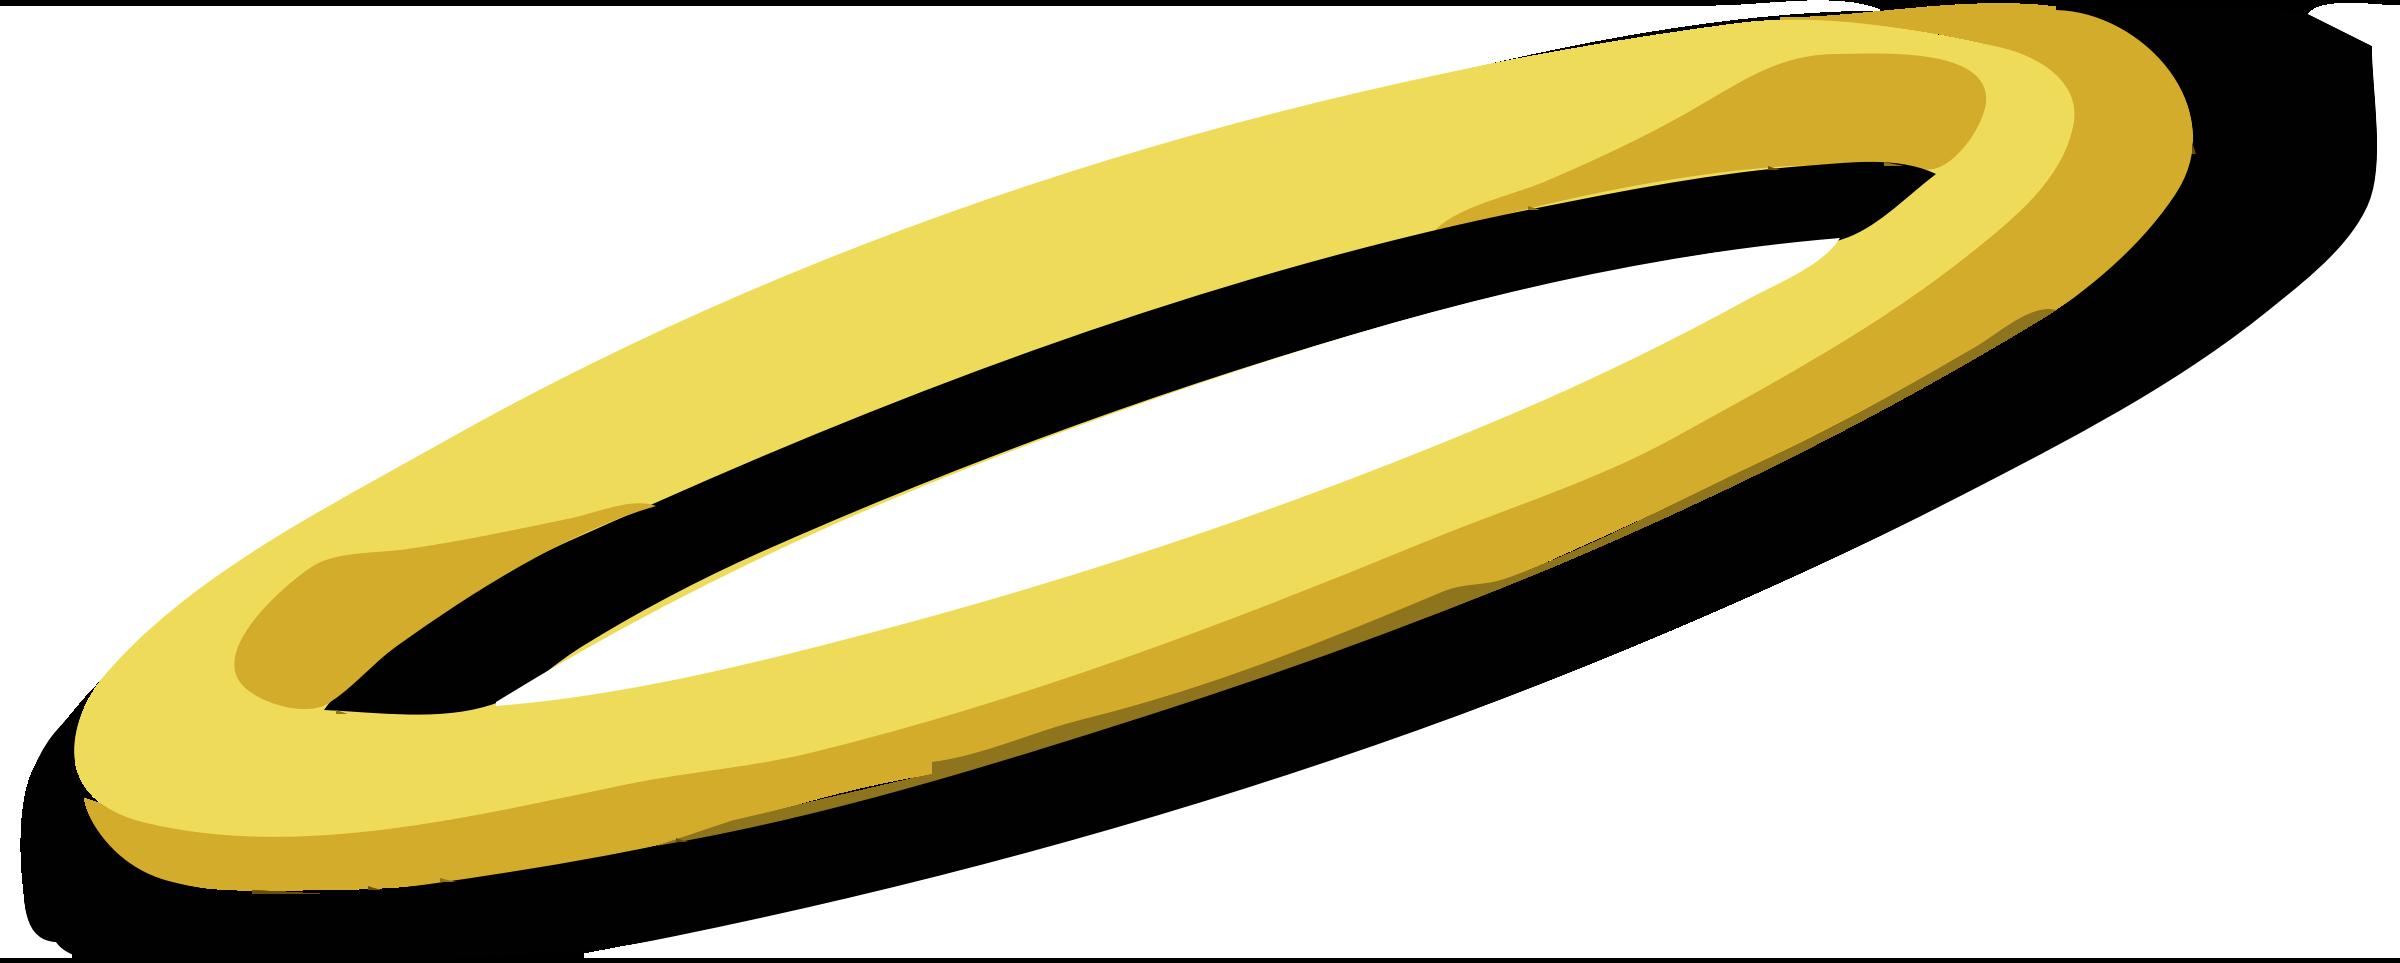 Halo clipart yellow Halo Clipart Halo